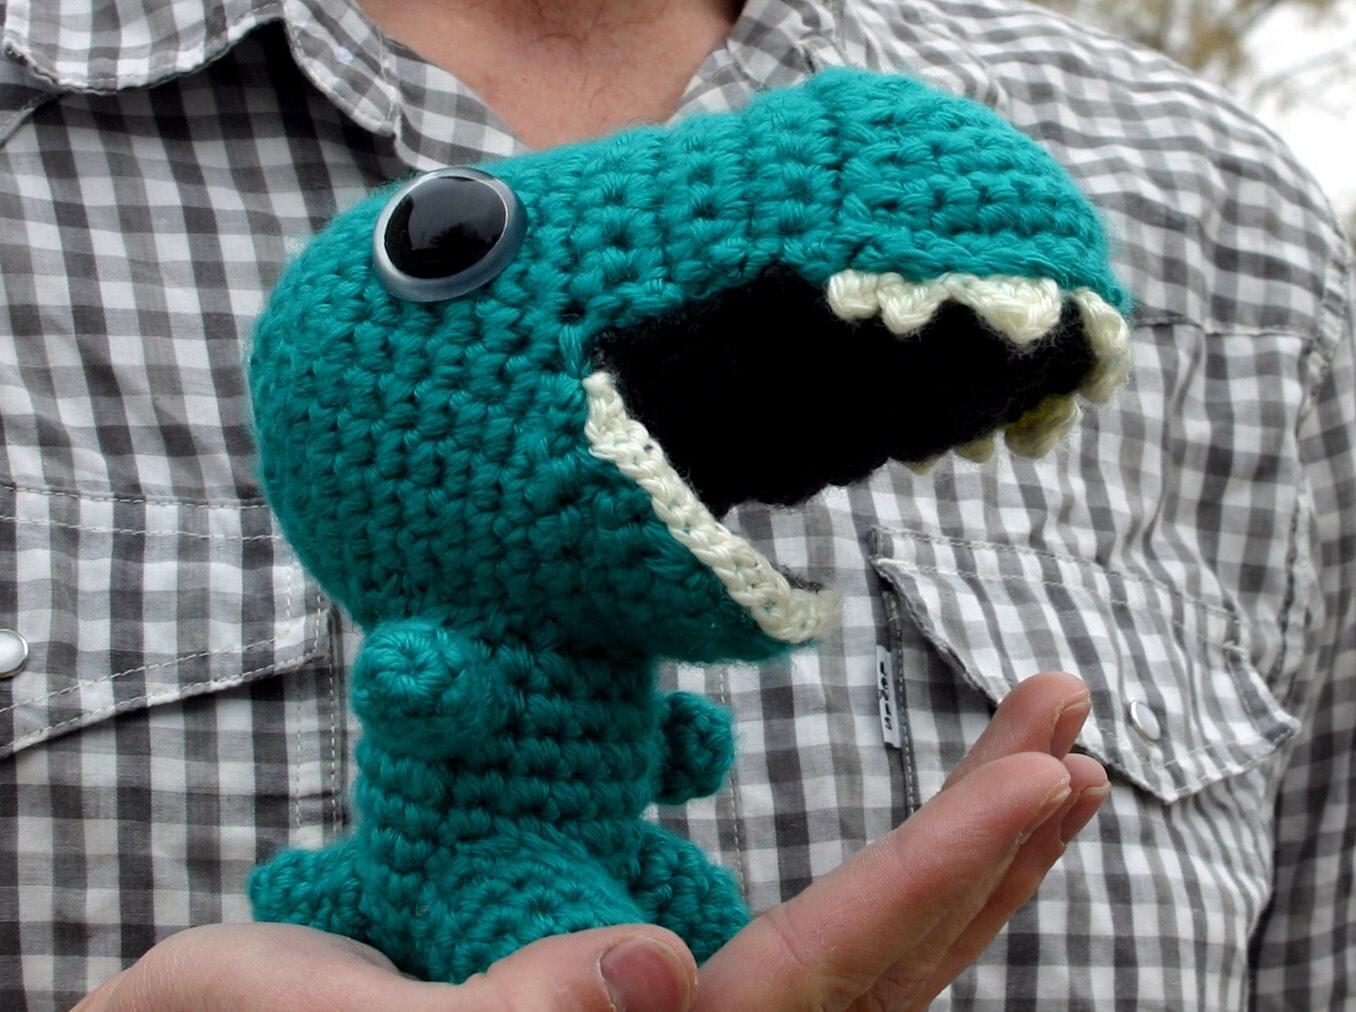 Amigurumi Open Mouth : Reginald Digital Crochet Pattern Amigurumi Dinosaur ...